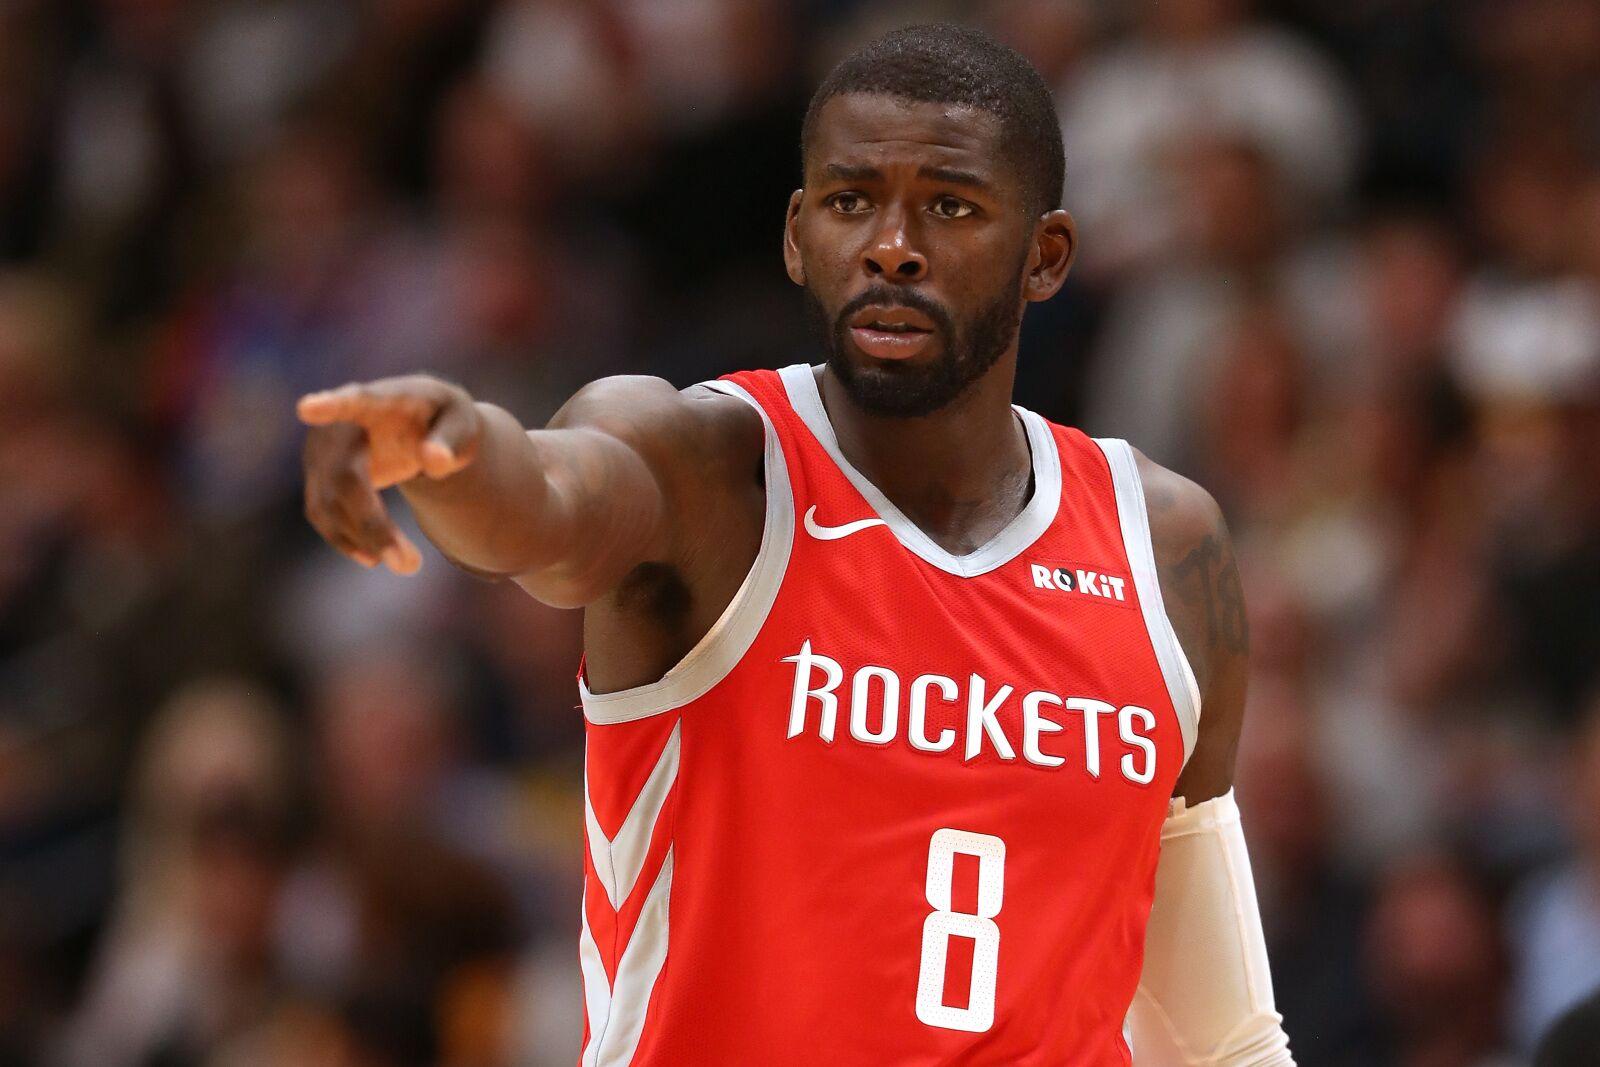 Philadelphia 76ers: Elton Brand robbed the Rockets of James Ennis